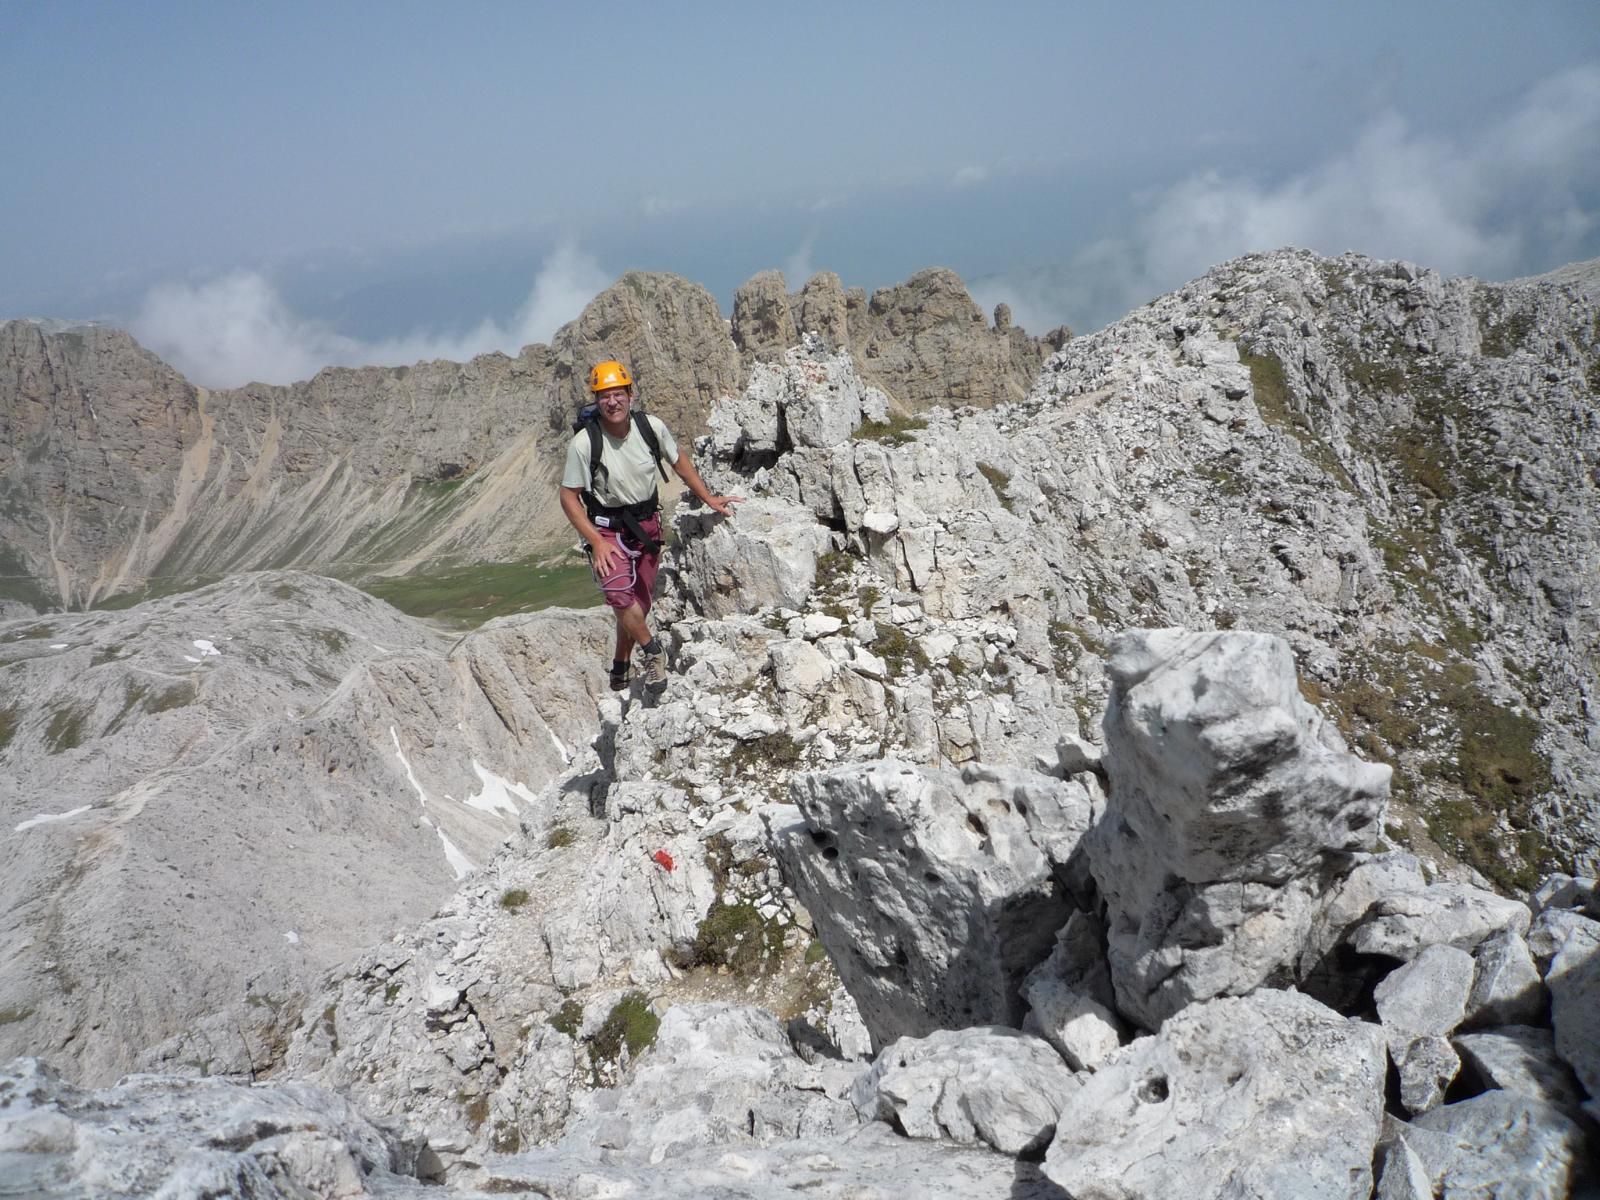 Klettersteig Rosengarten : Laurenzi klettersteig bergsteigen.com